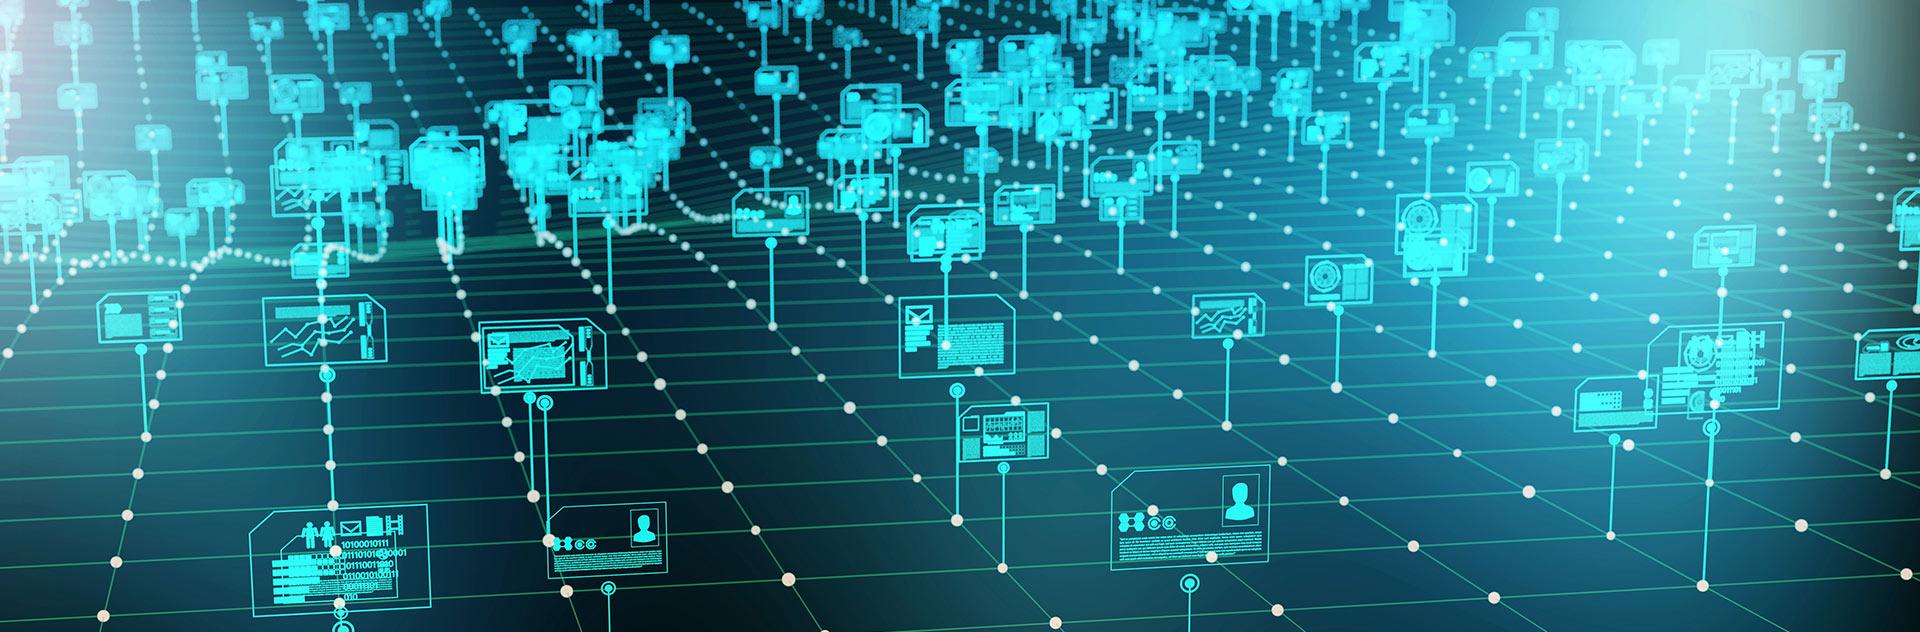 Fortion Media mining provides advanced data exploitation for Intelligence